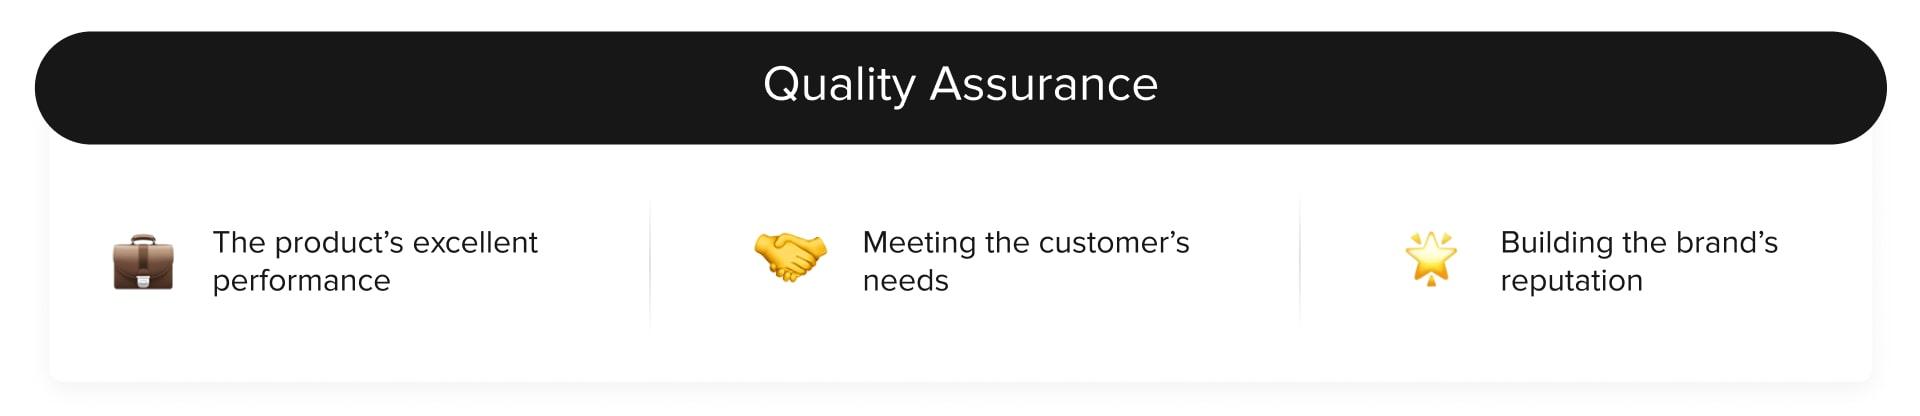 quality assurance benefits